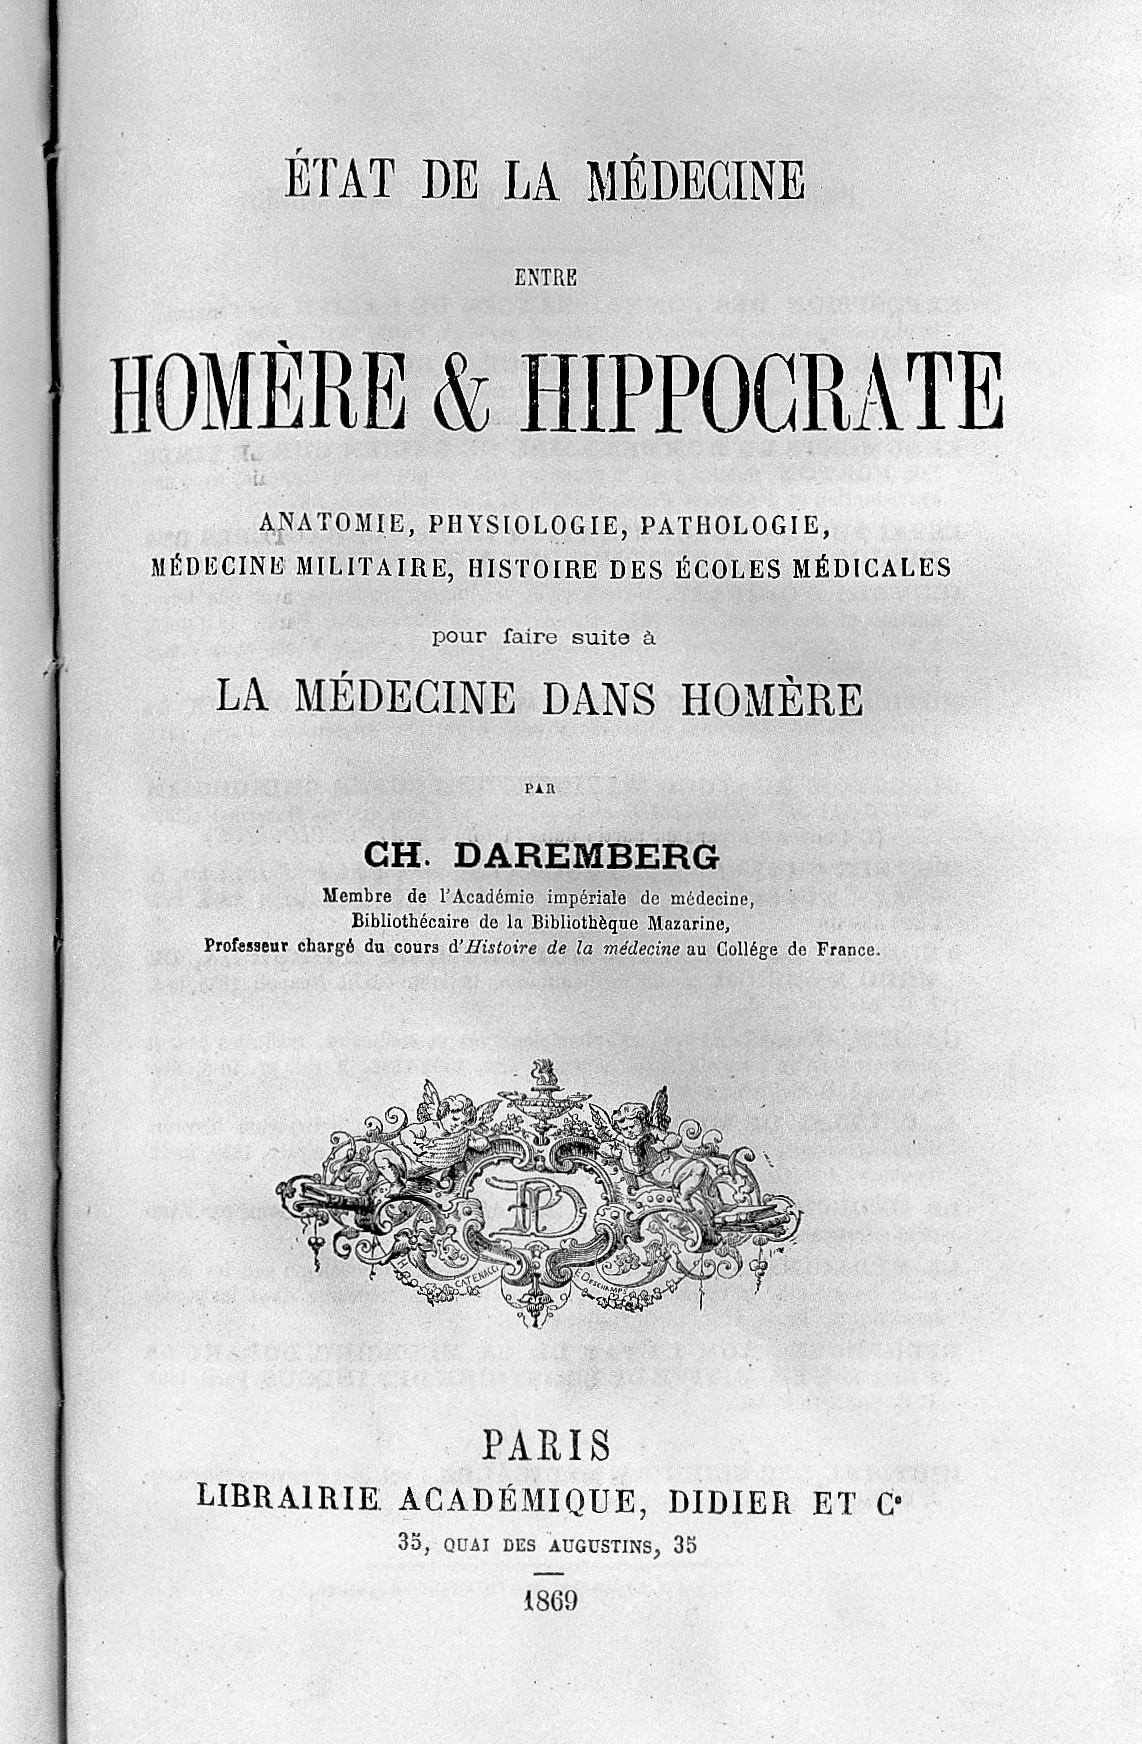 File:Etat de la medince entre Homere et Hippocrate, by Daremberg ...